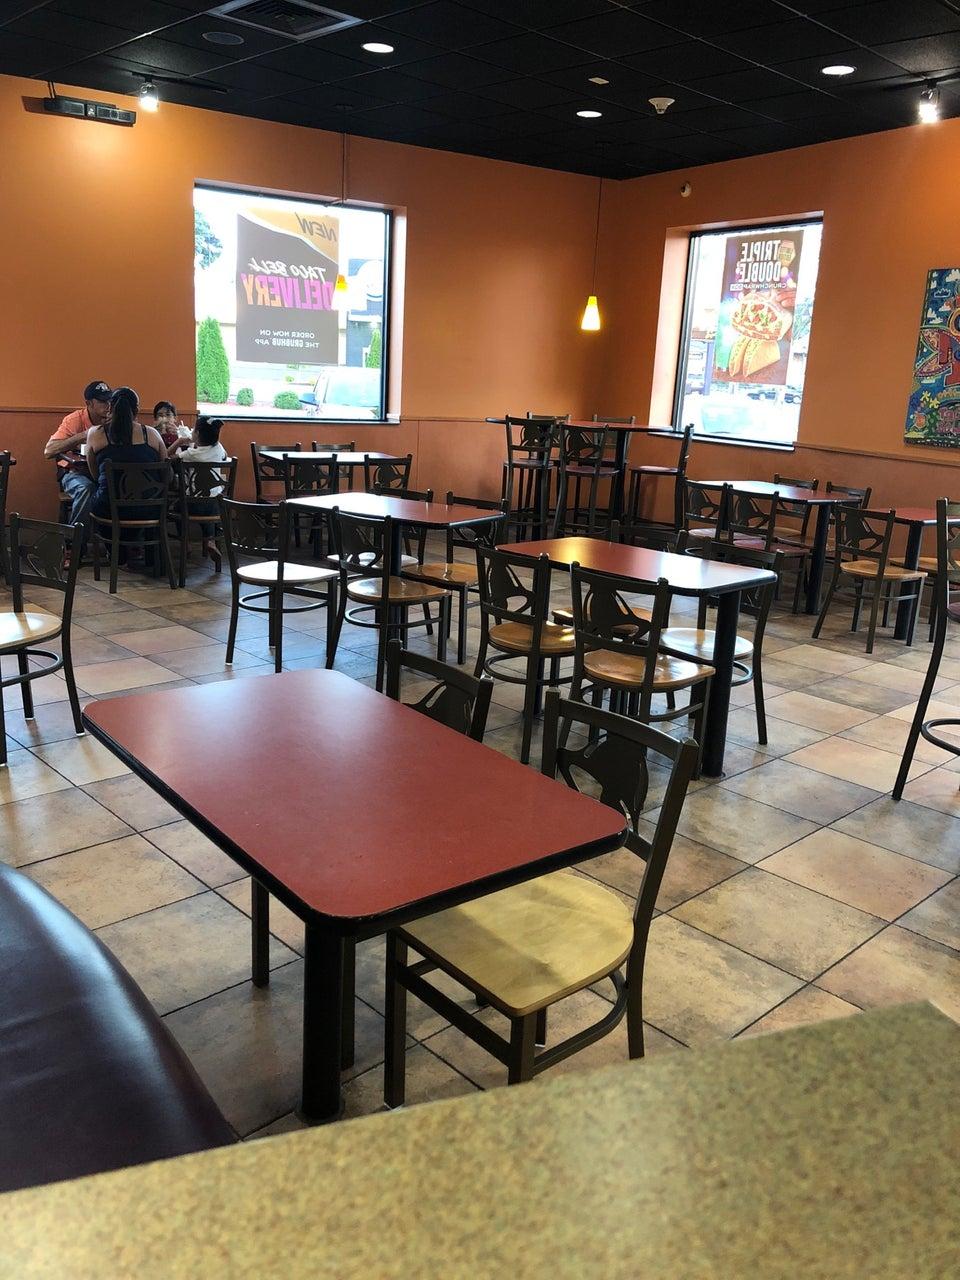 Pizza Hut 1709 Merrick Rd, Merrick